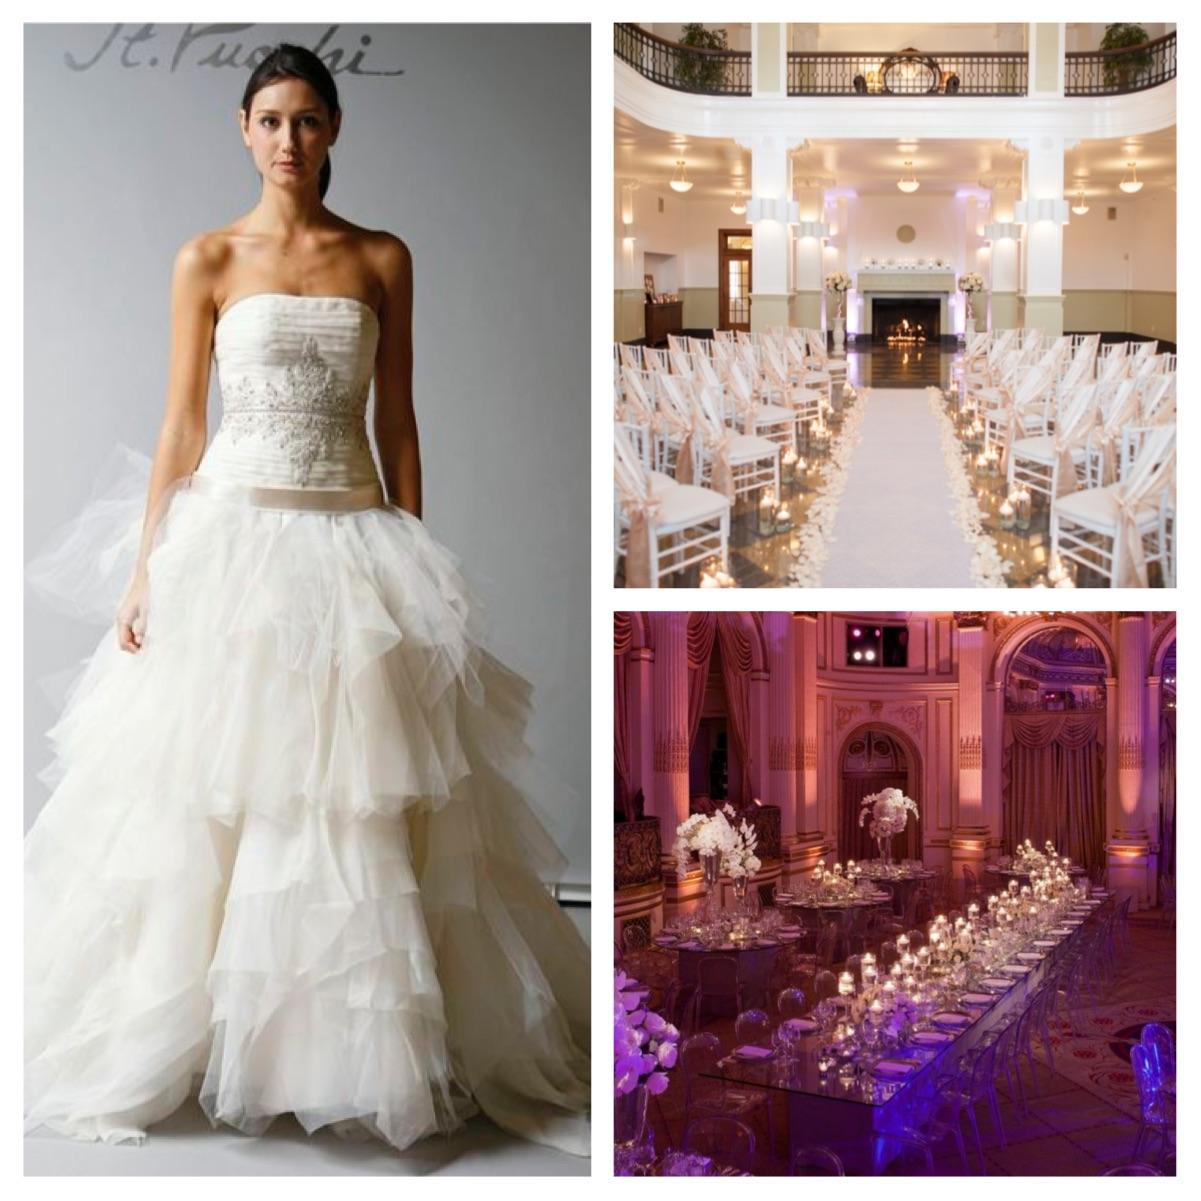 Images:  St. Pucchi Z361,  Elizabeth Ann Designs  (top),  Bridal Detective  (bottom)